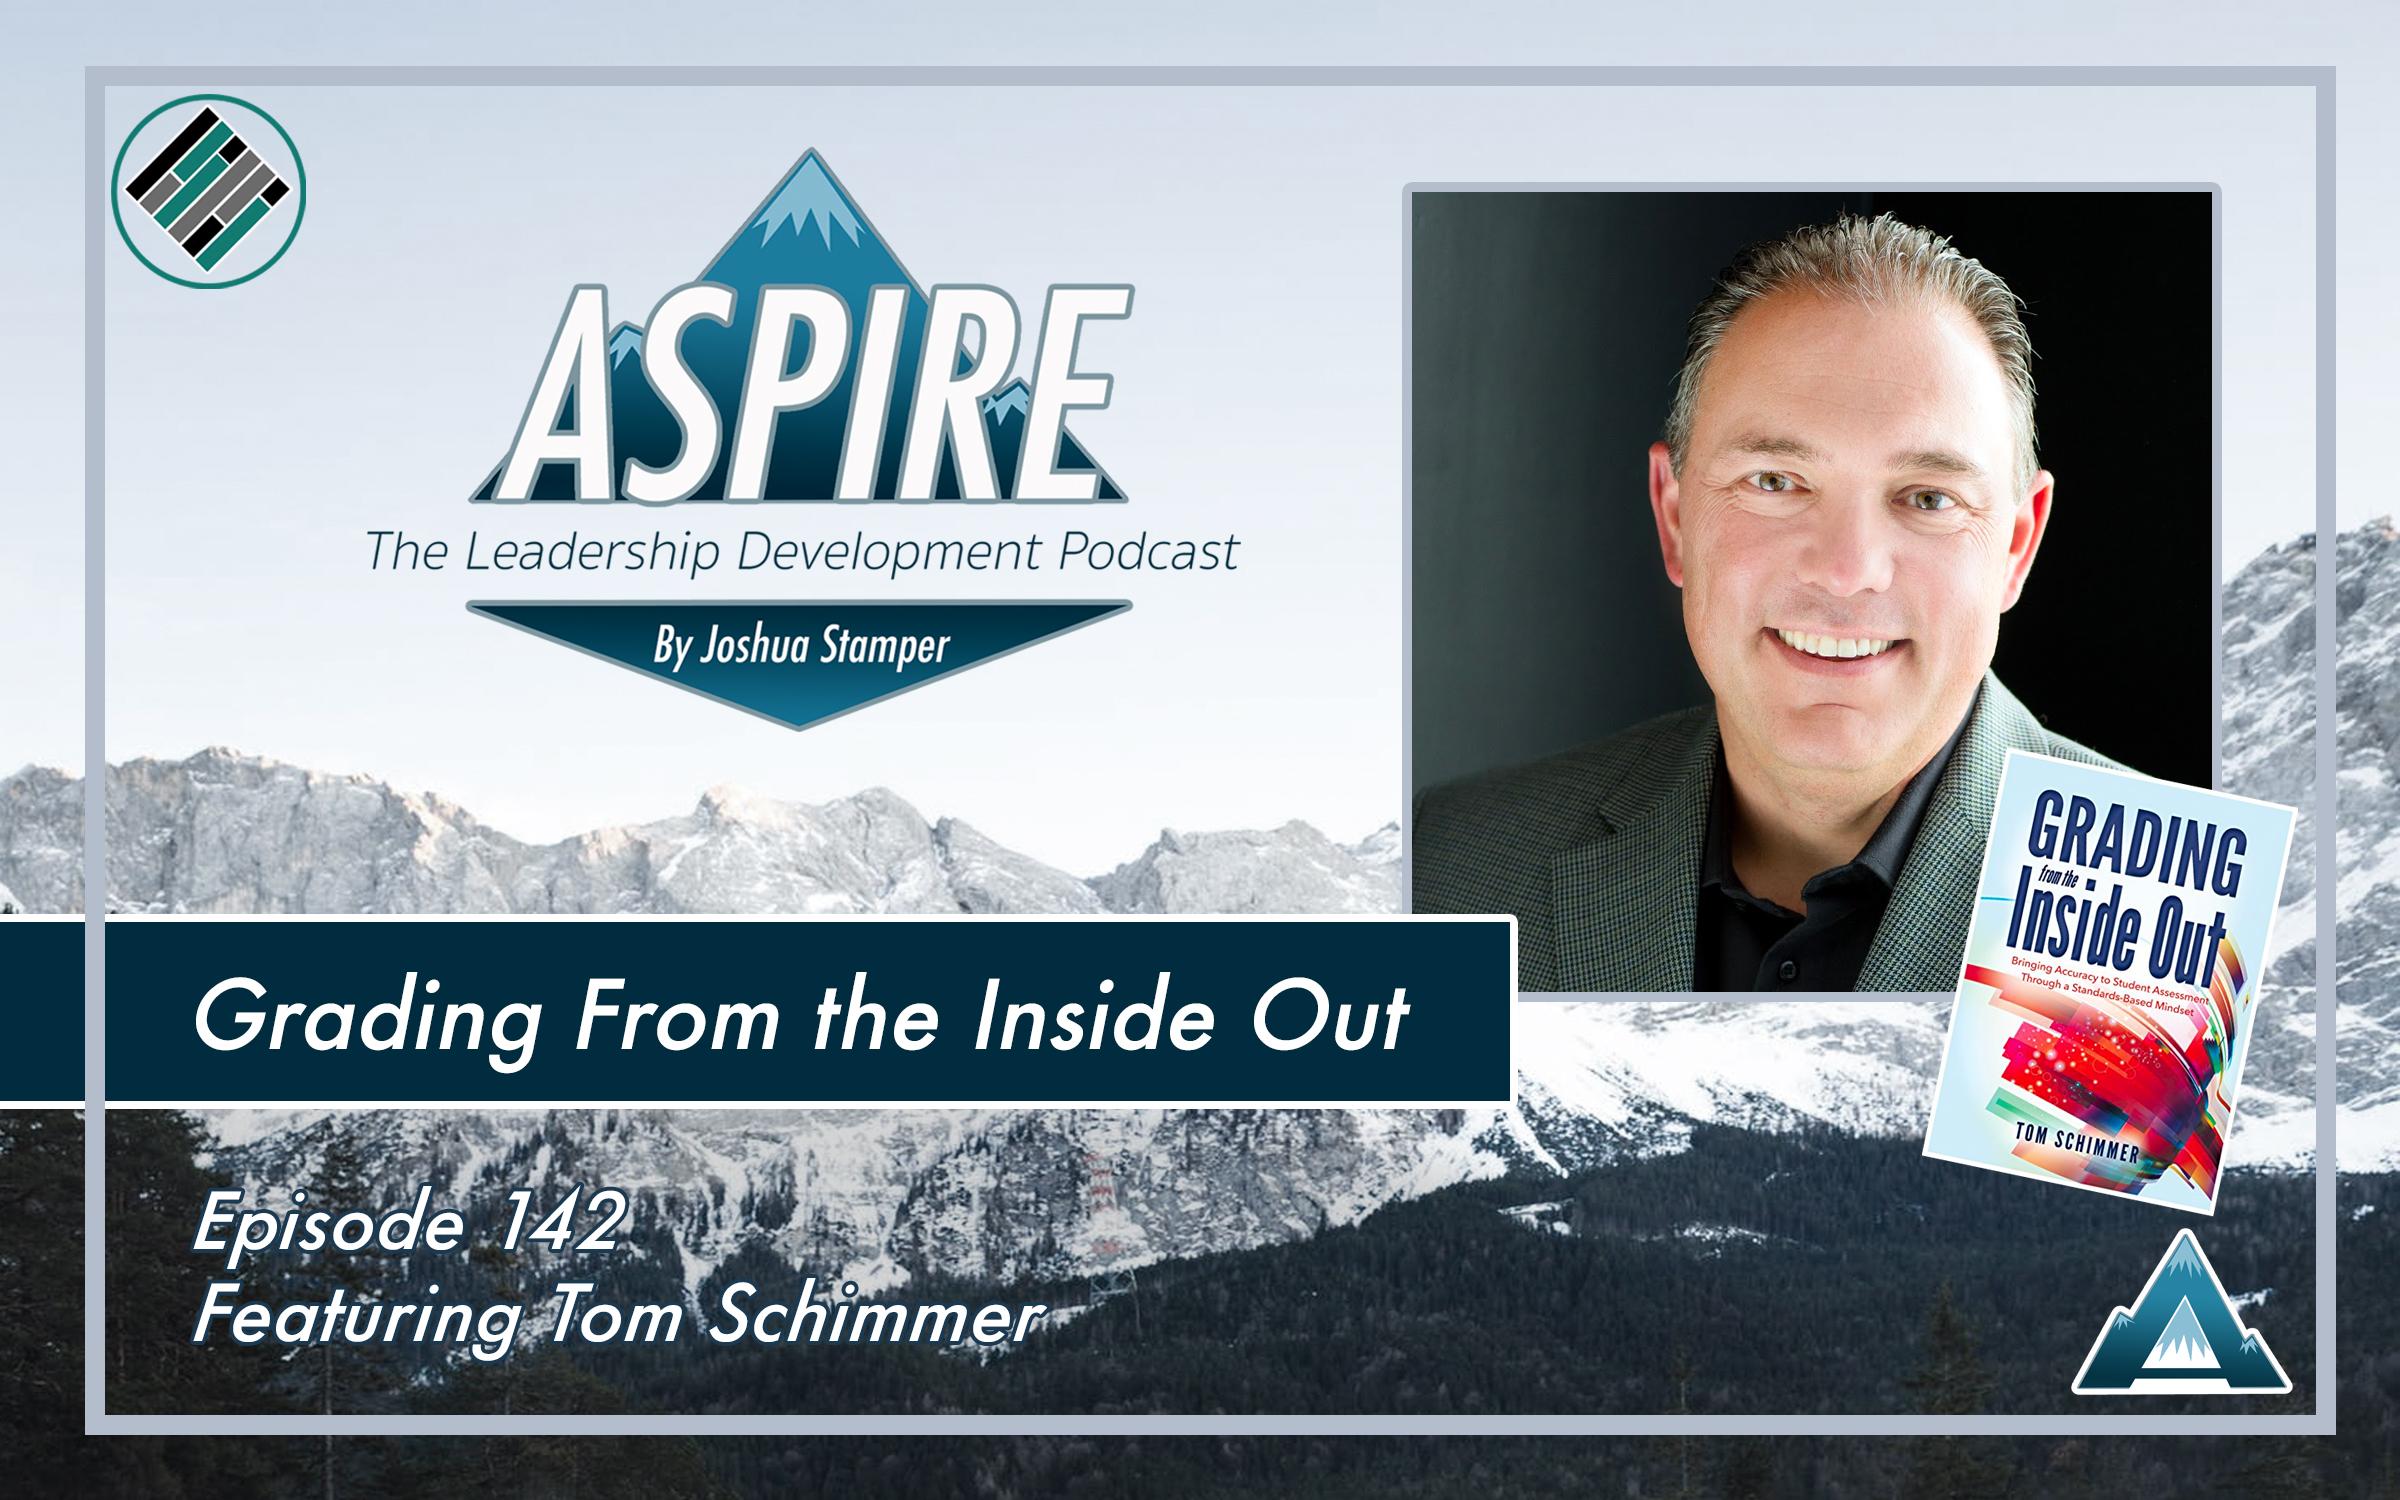 Joshua Stamper, Tom Schimmer, Grading From the Inside Out, Aspire: The Leadership Development Podcast, #AspireLead